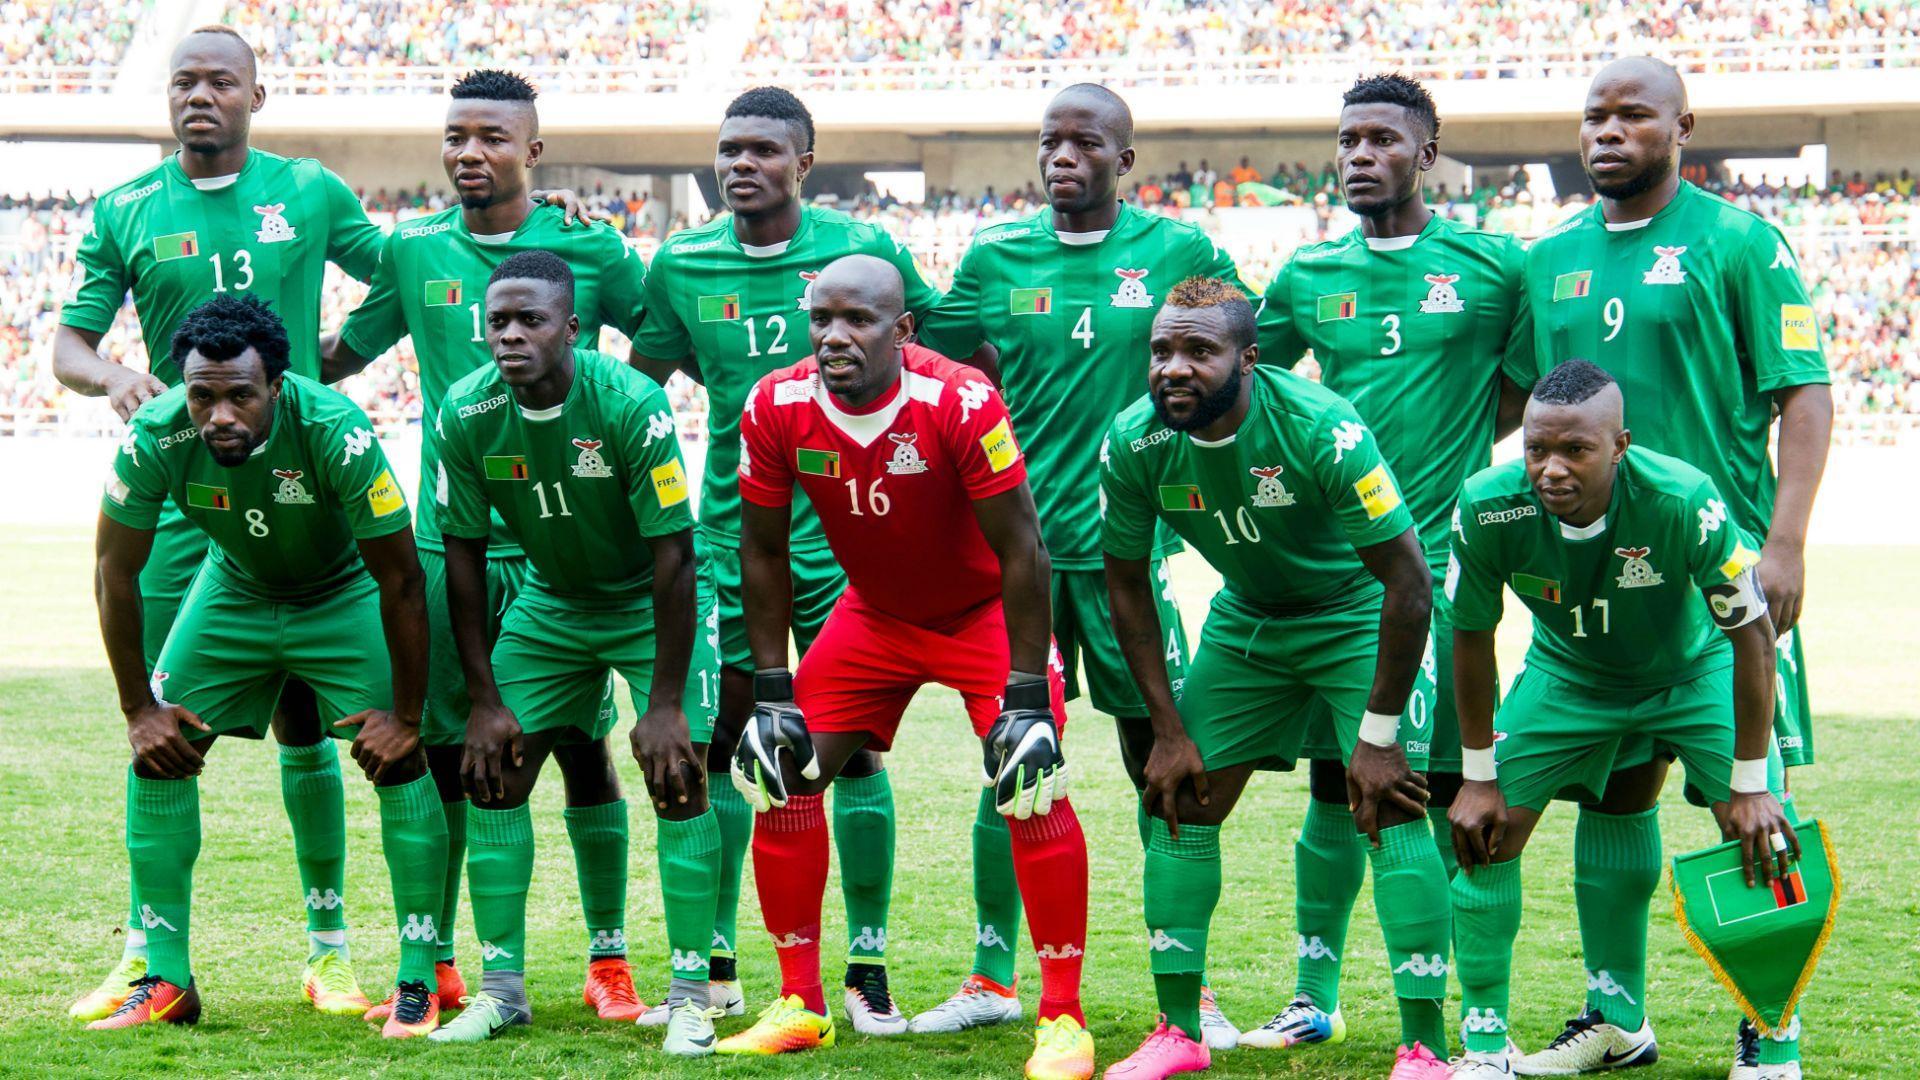 Nigeria National Football Team Background 6